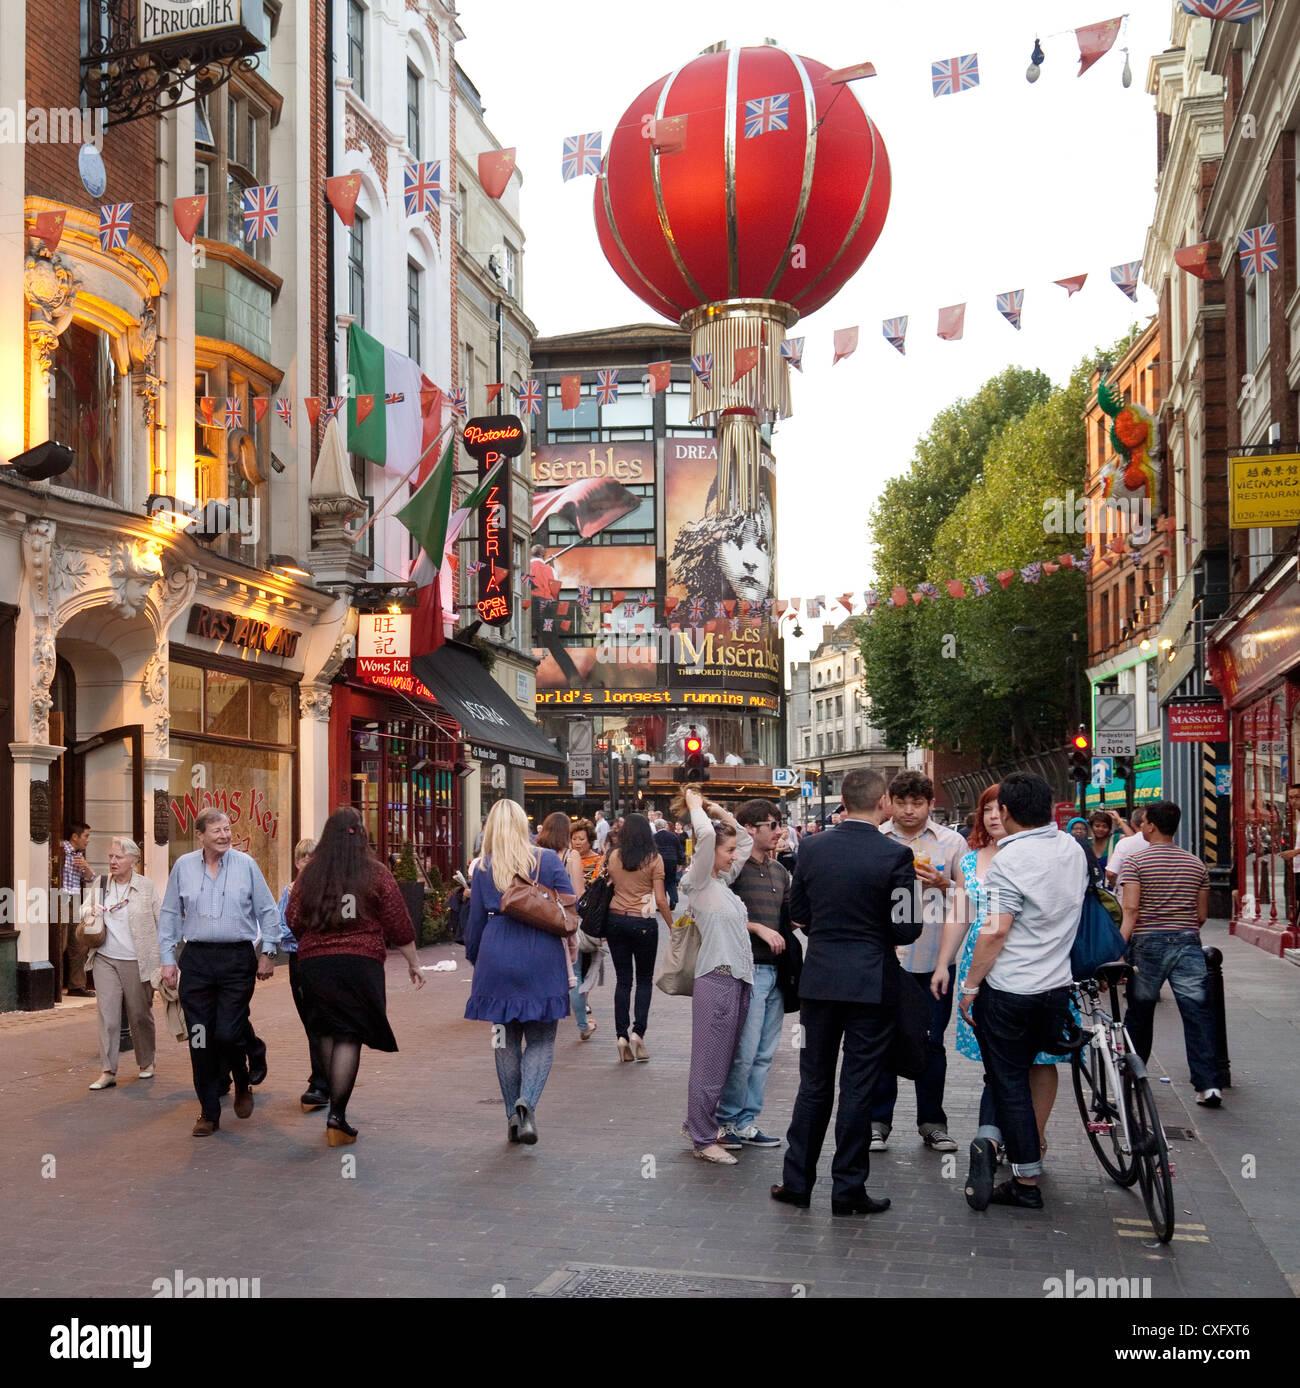 Street scene, early evening, Wardour St, Chinatown, london W1D, UK - Stock Image